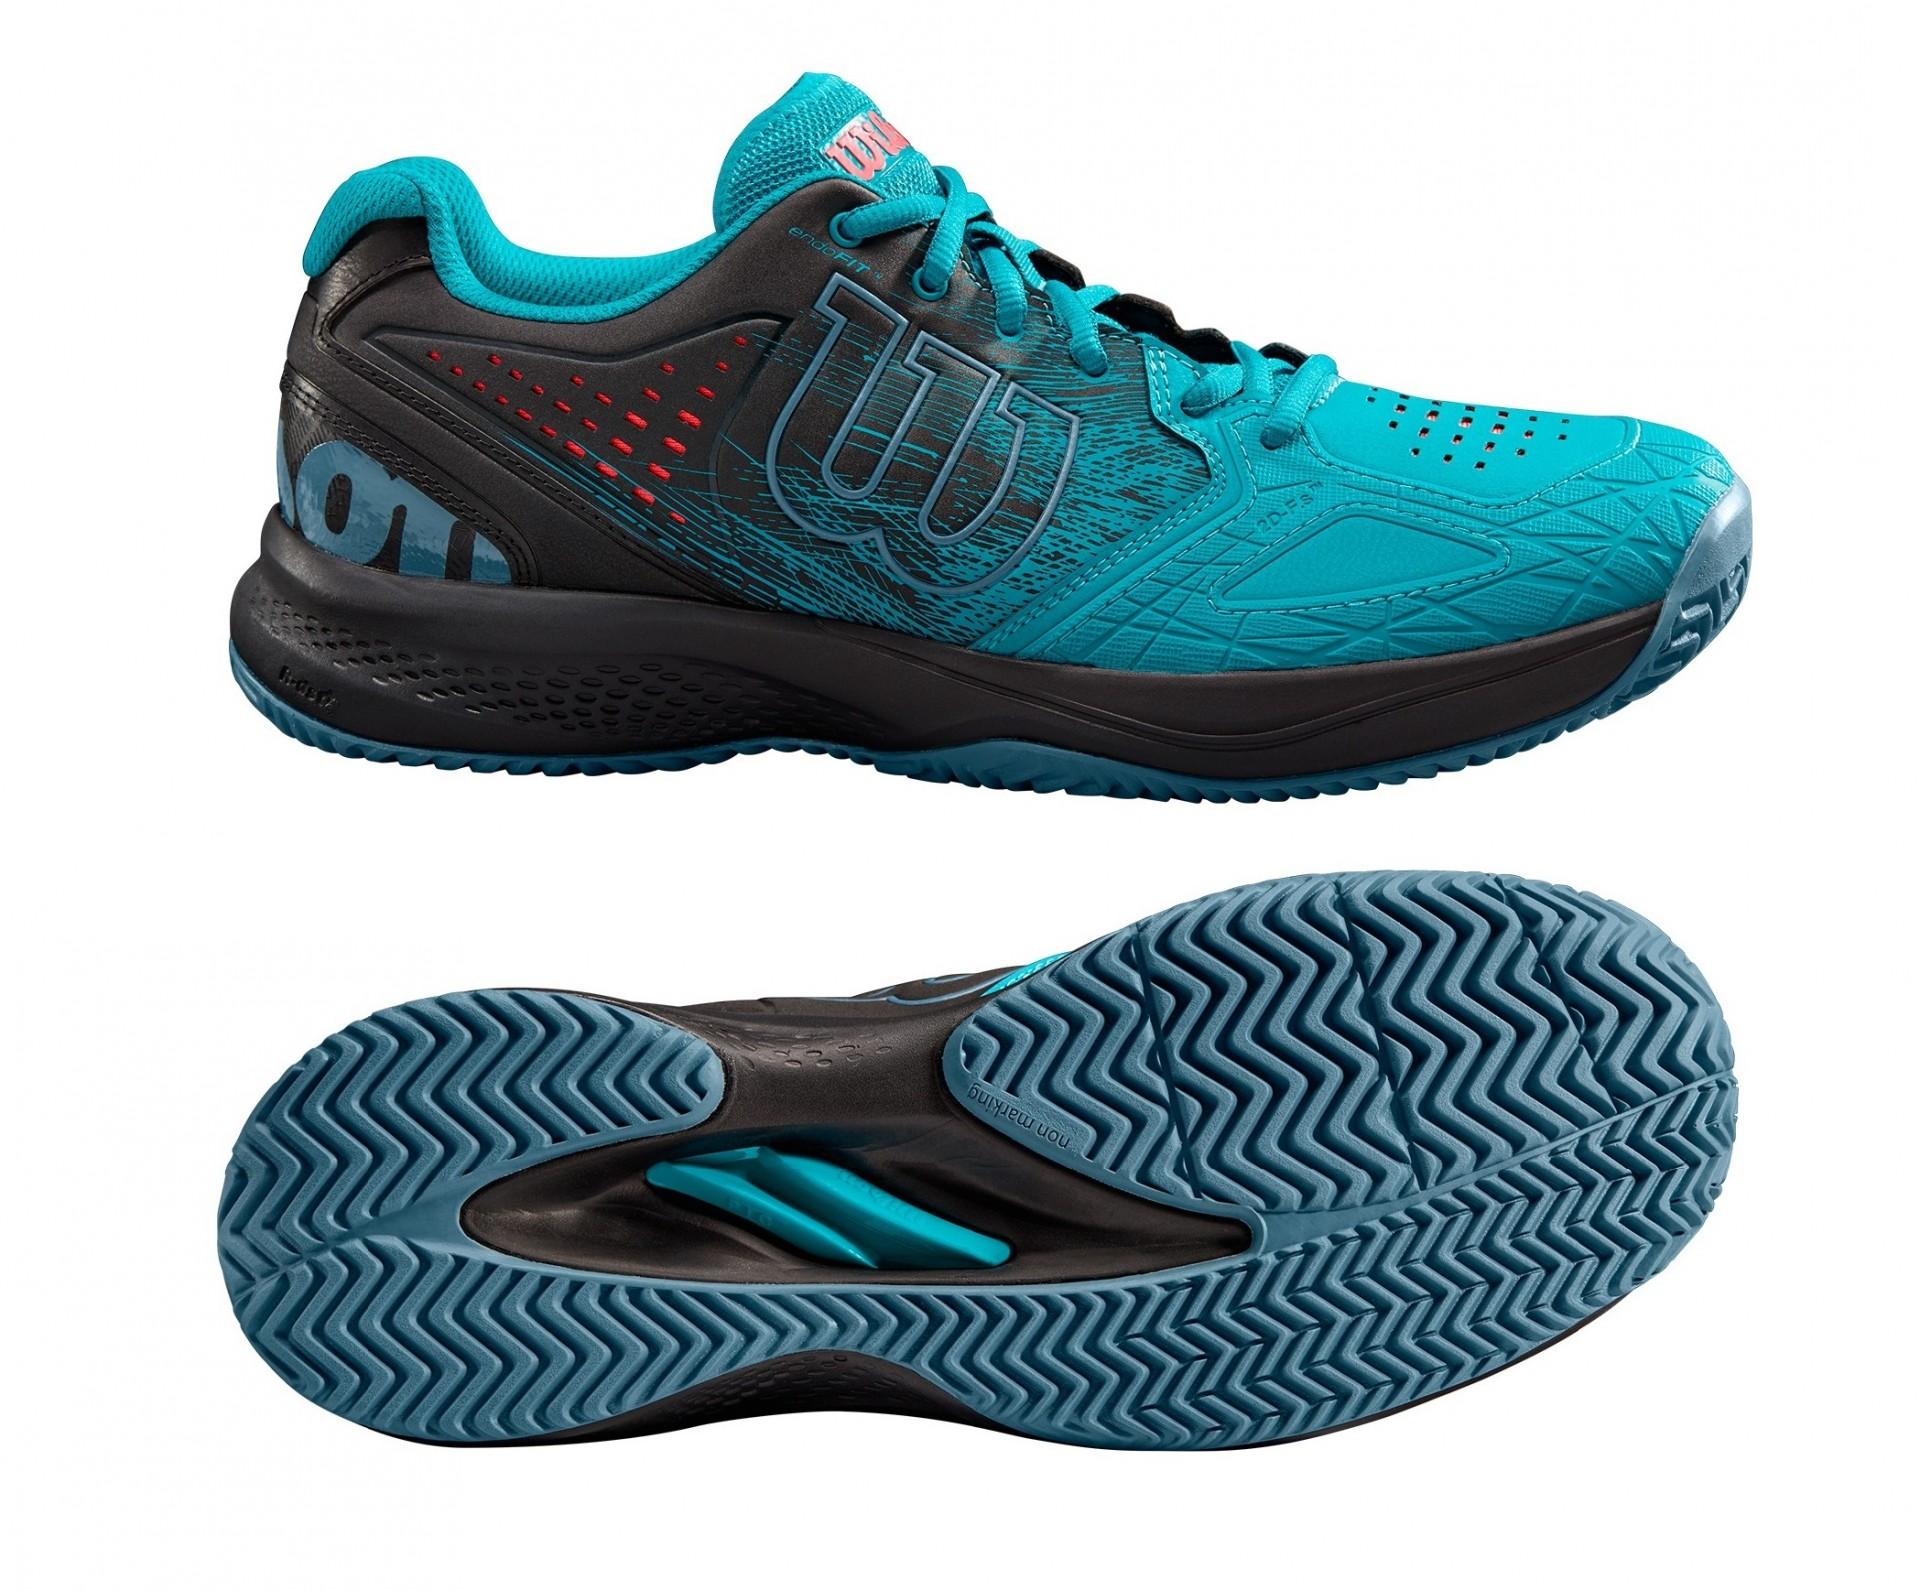 87f463234b16 Tenisová obuv Wilson Kaos Comp 2.0 WRS325120 modrá